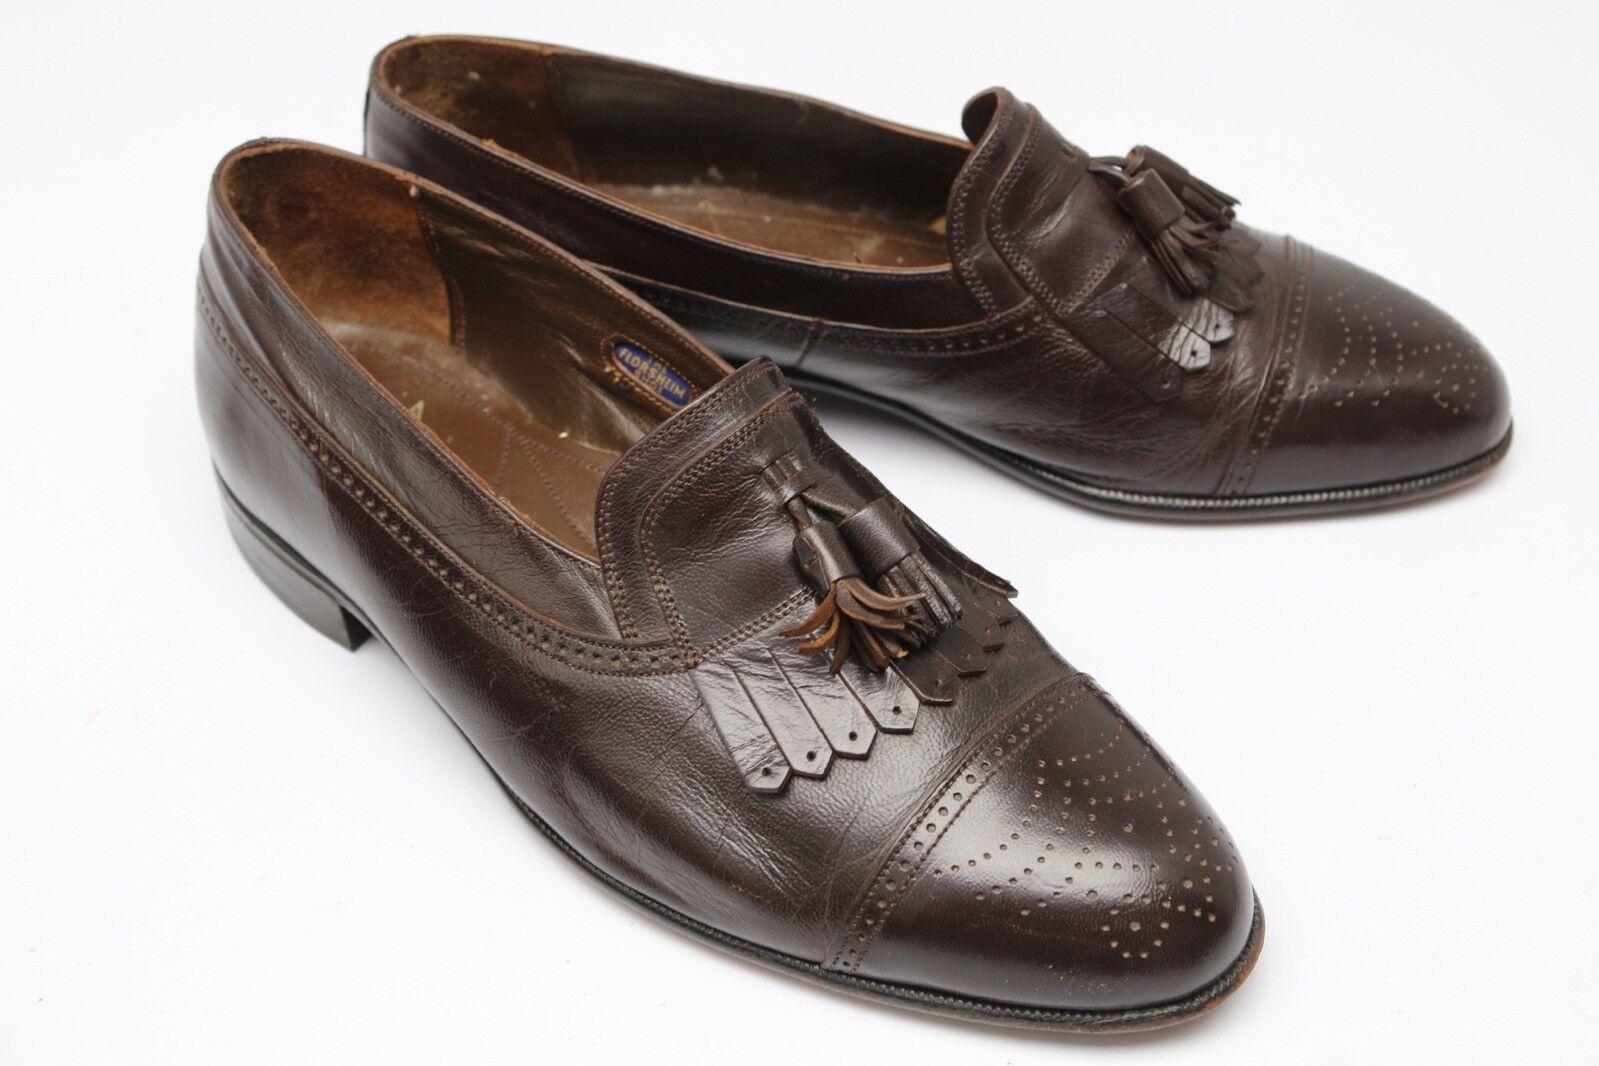 Florsheim Cap Toe Tassel Kiltie Loafers 7.5 EEE 3E Brogue Brown Leather shoes